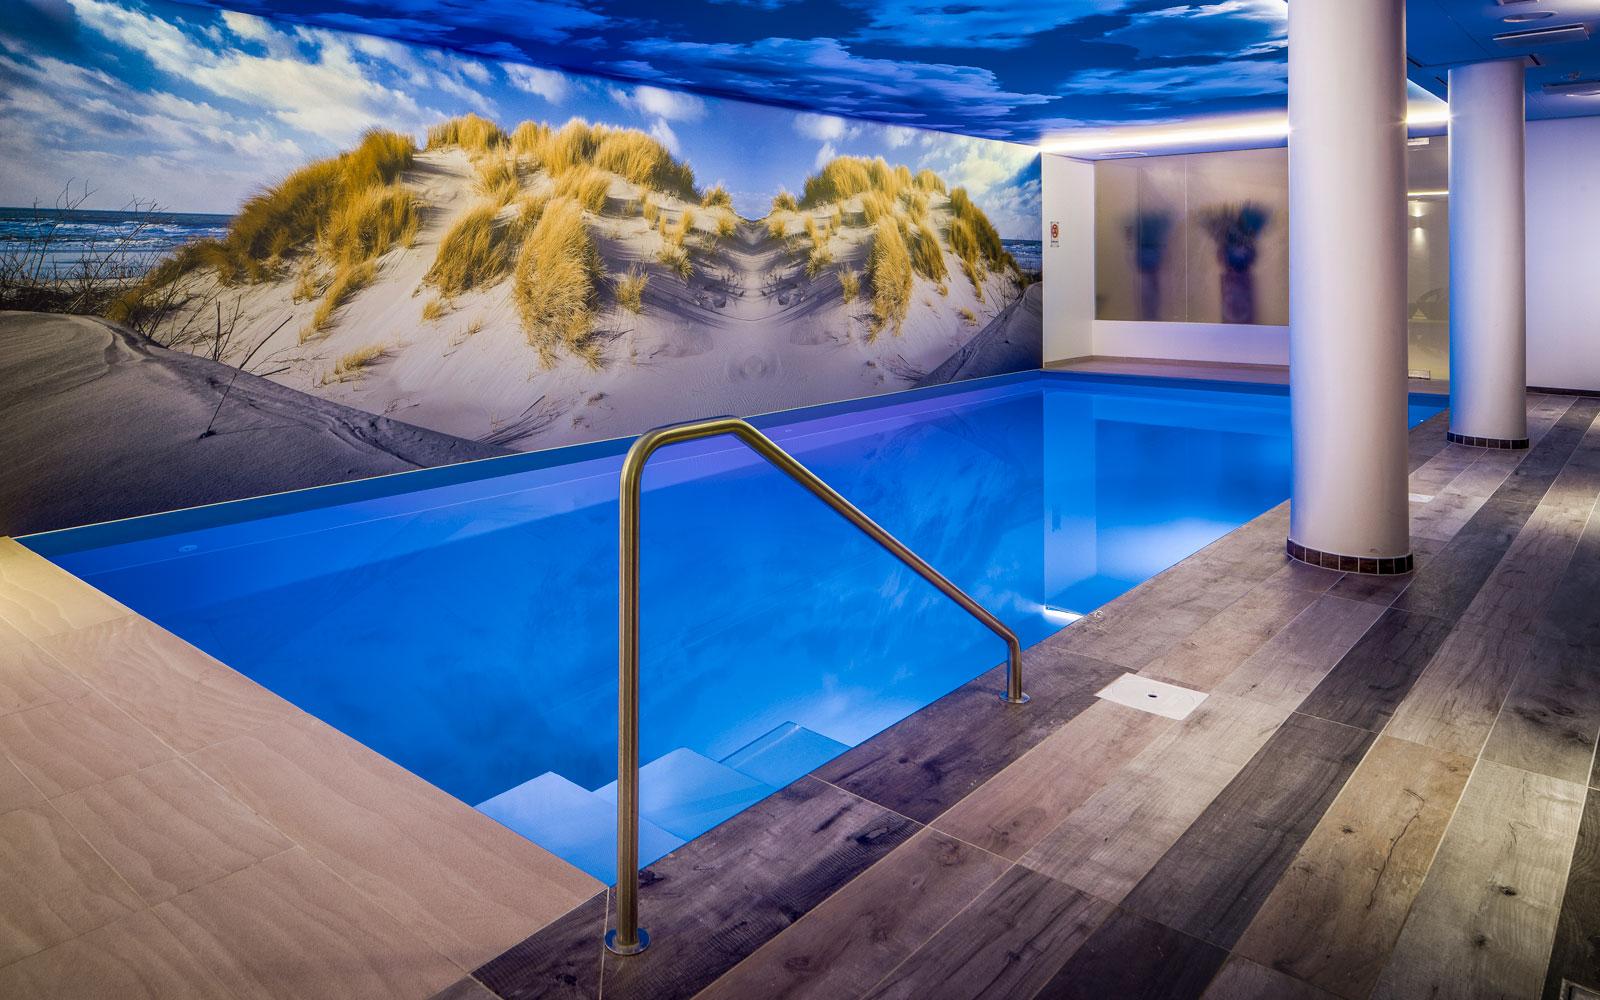 Wellness, badhotel Domburg, sauna, zwembad, douche, Stephen Versteegh, Versteegh Design